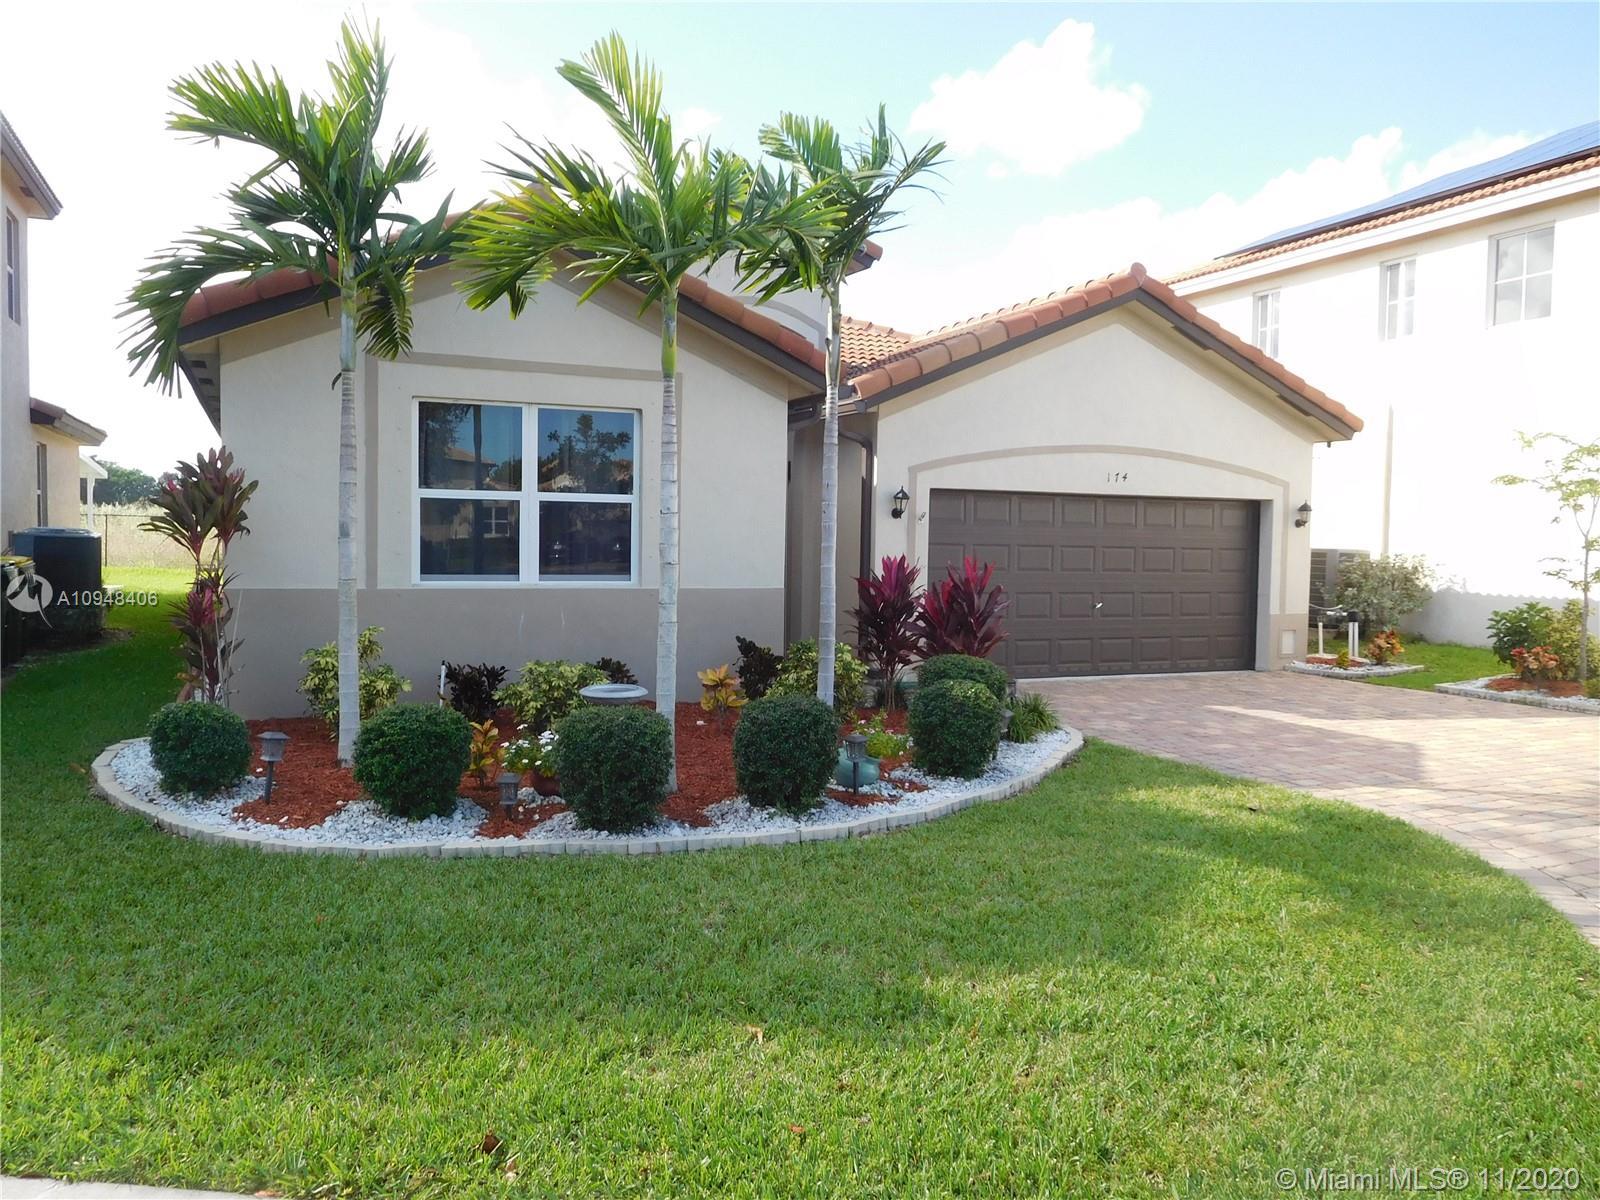 174 SE 21st Ter Property Photo - Homestead, FL real estate listing